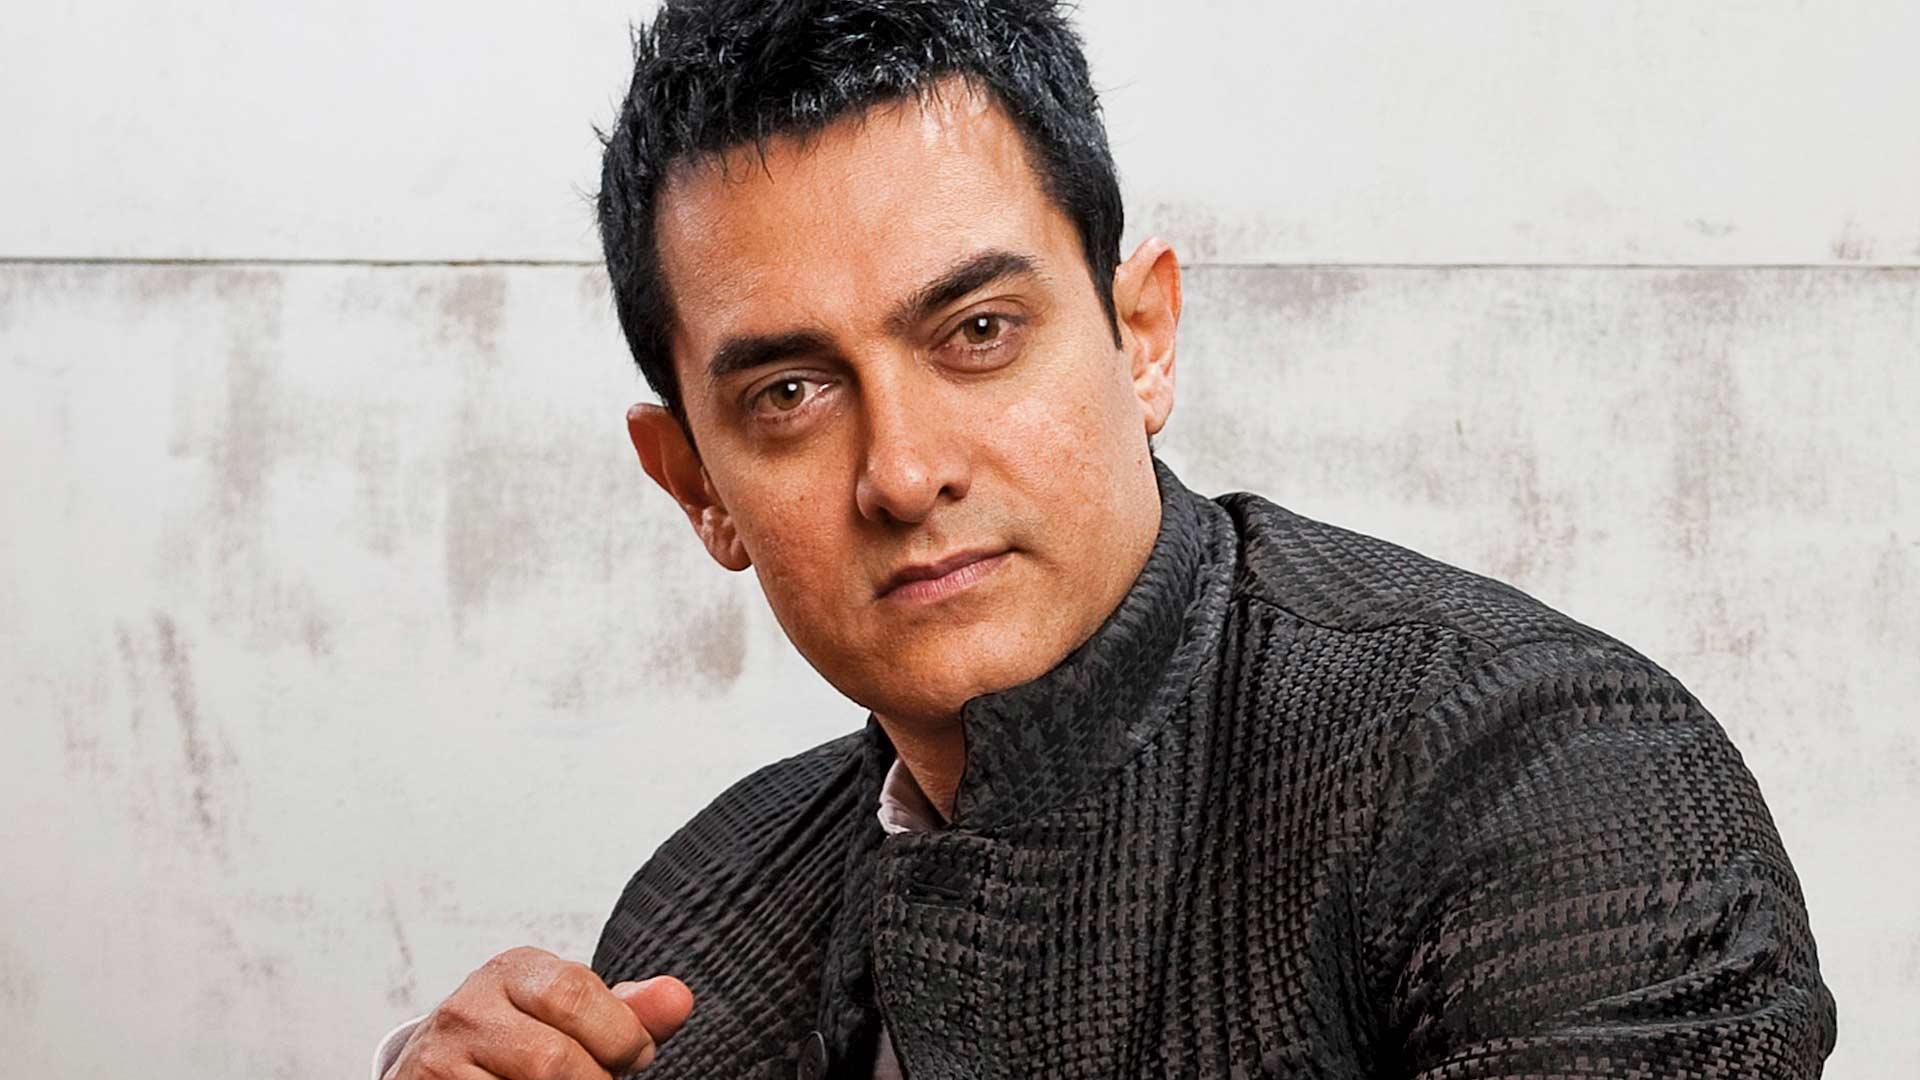 Aamir Khan: International Star To Know   Variety